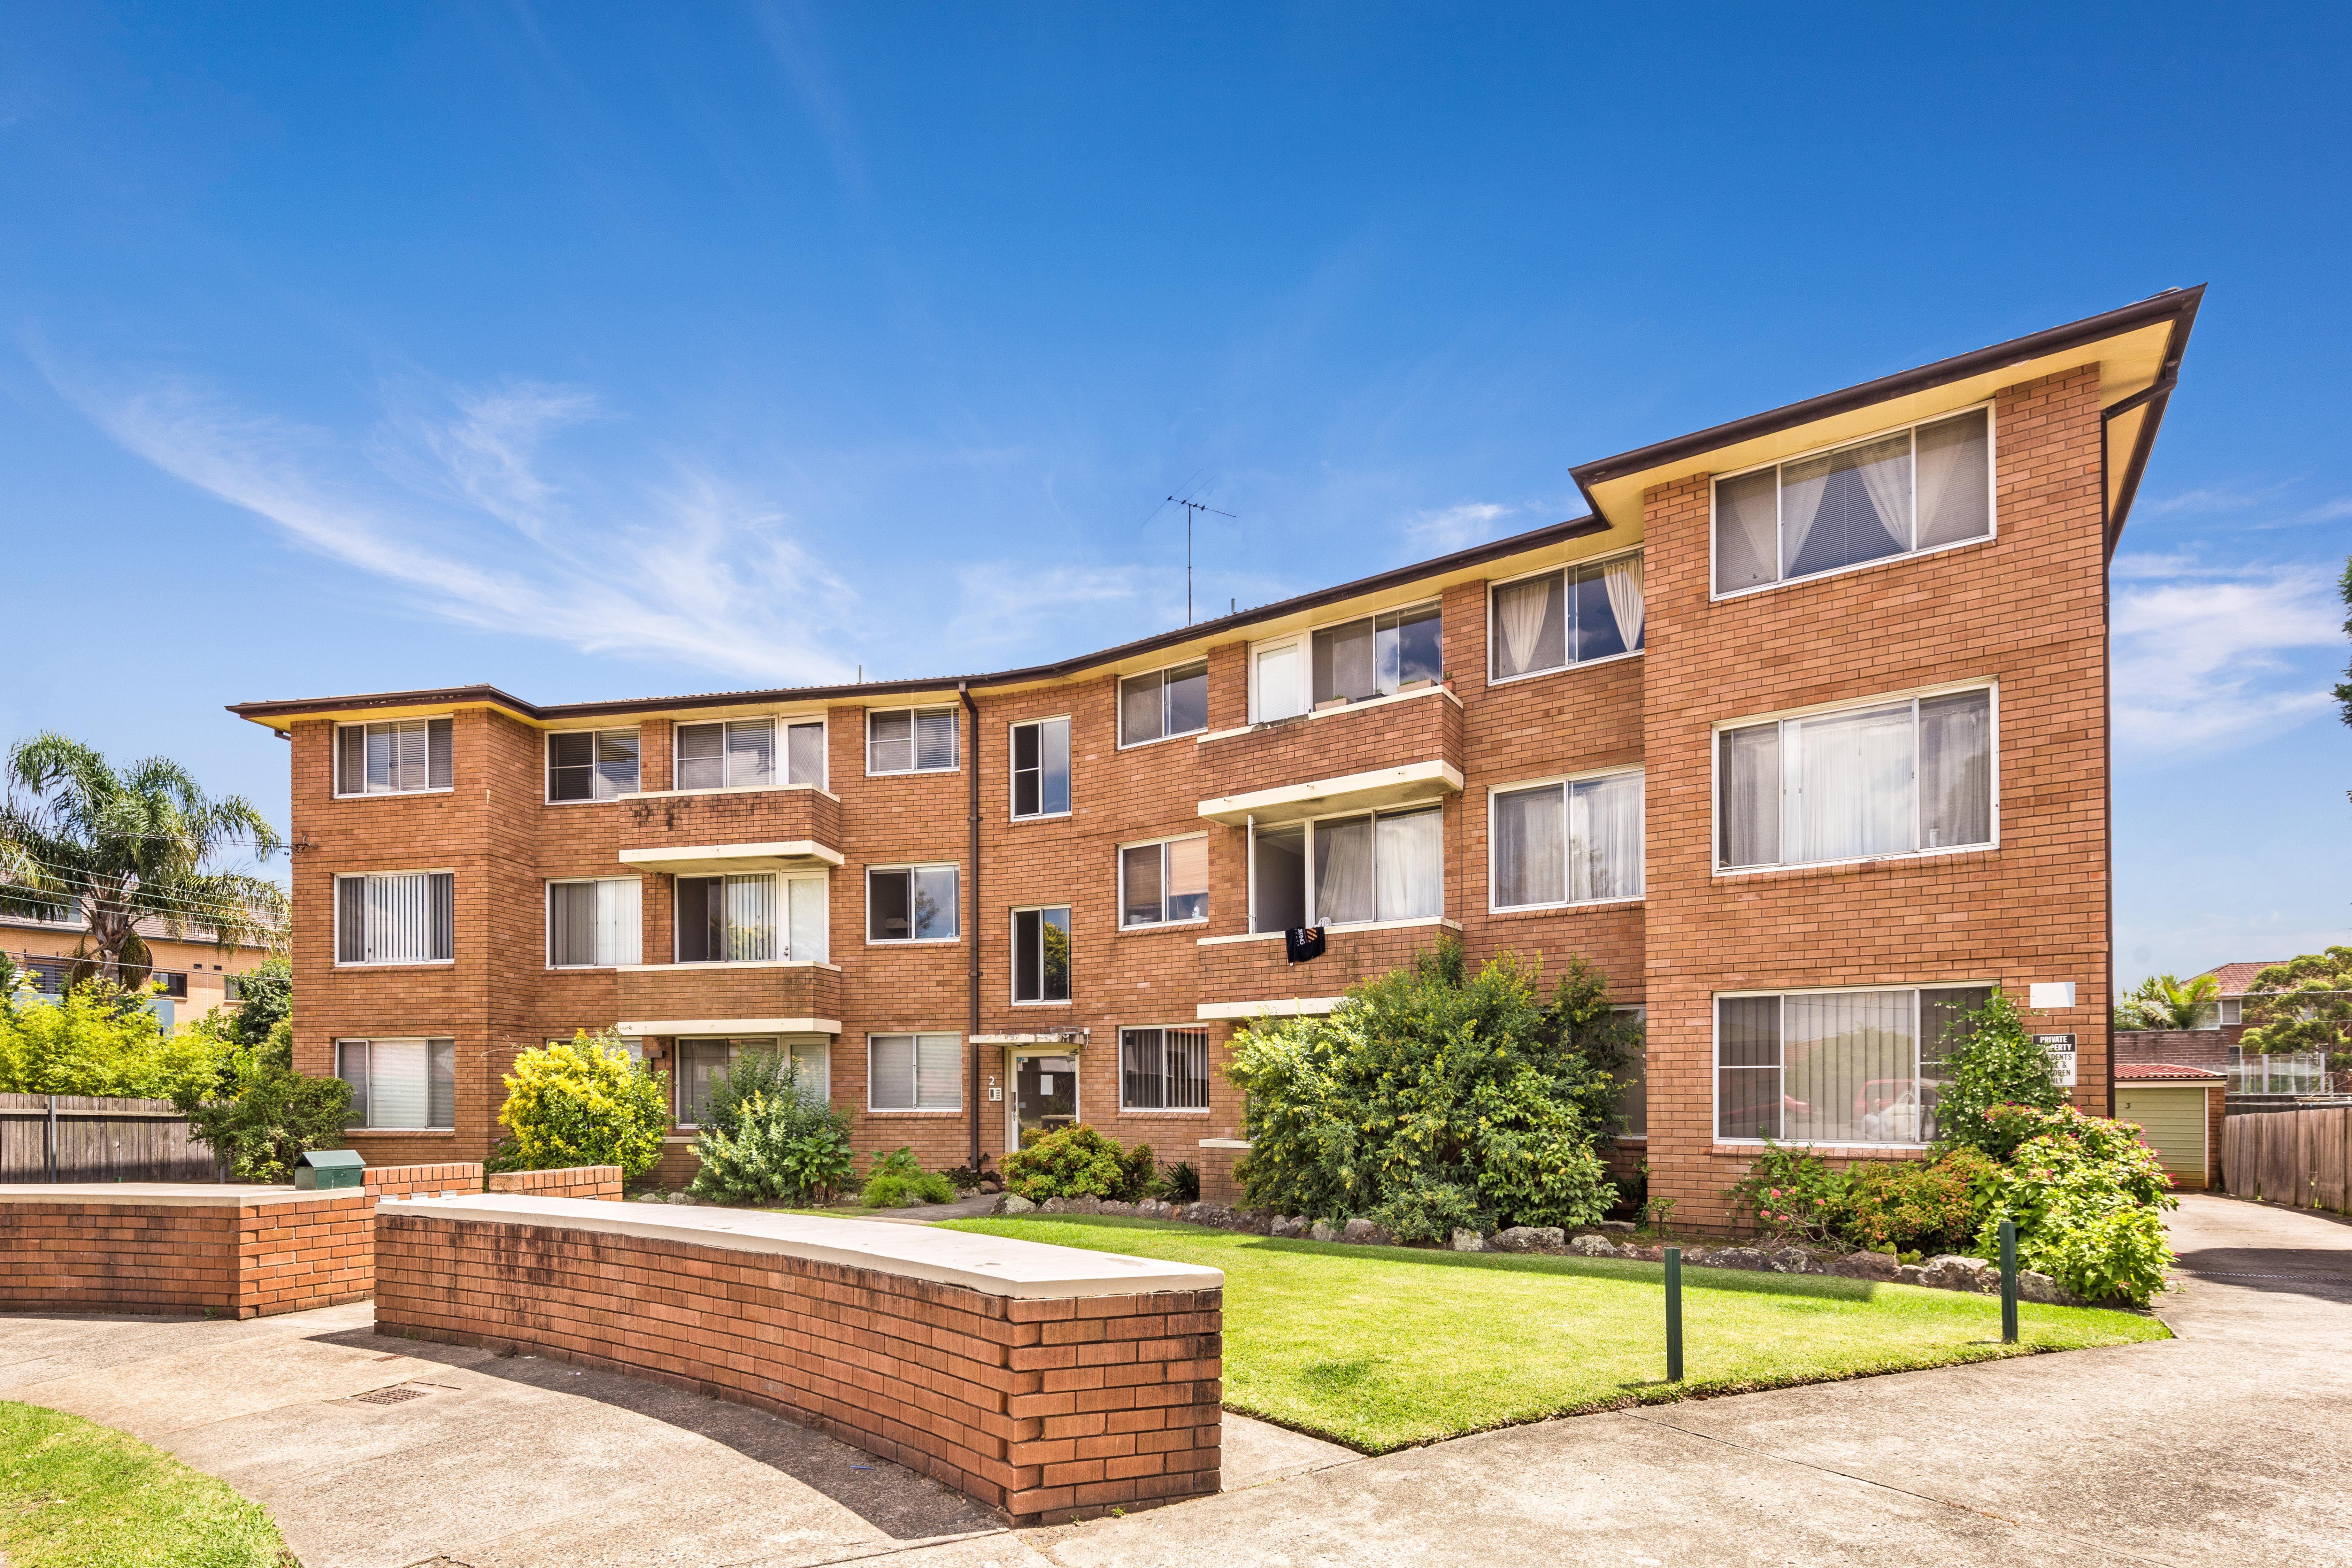 6/2 Mooney Street, Strathfield South NSW 2136